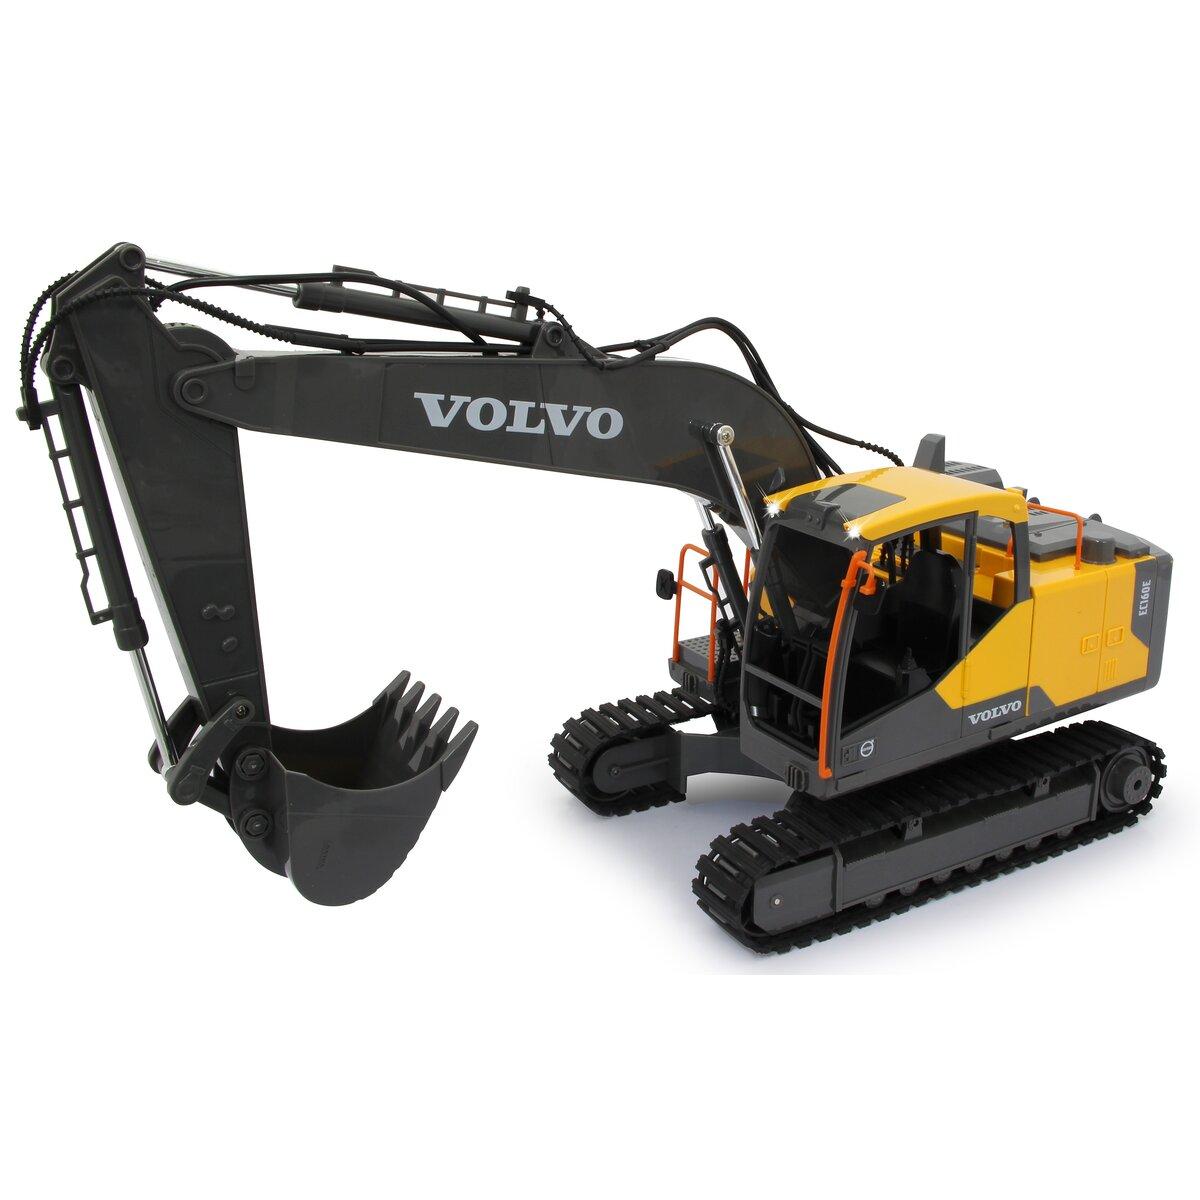 Jamara Digger Volvo EC160 1:16 2,4GHz